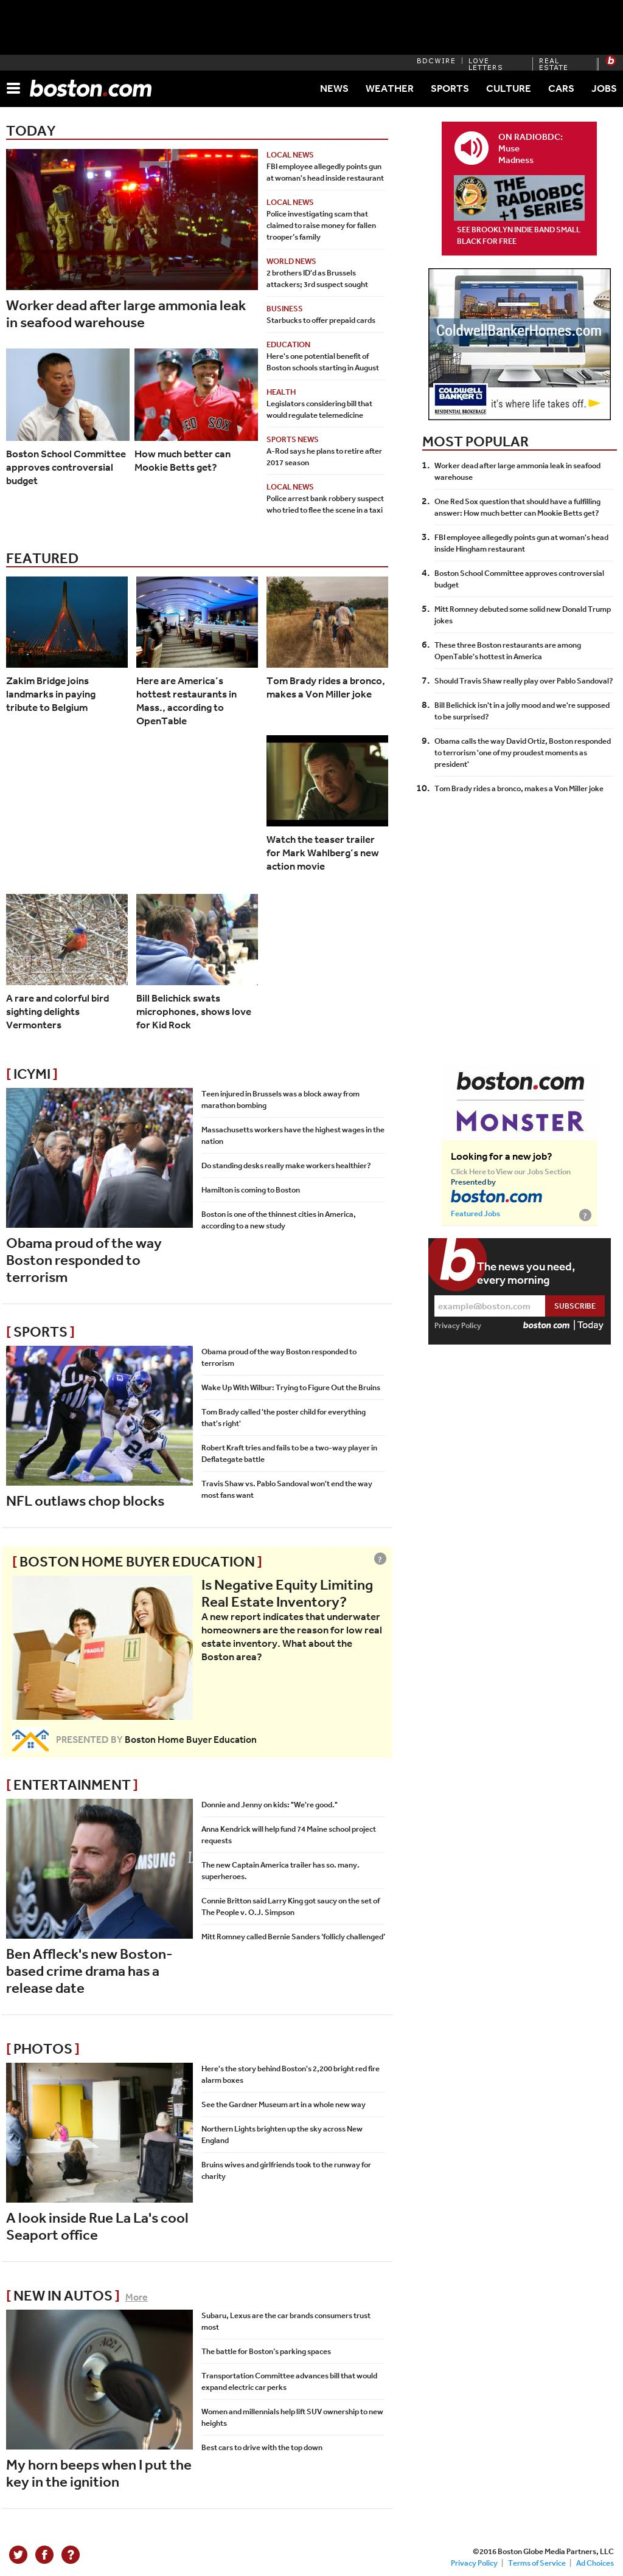 Boston.com at Thursday March 24, 2016, 4:01 a.m. UTC